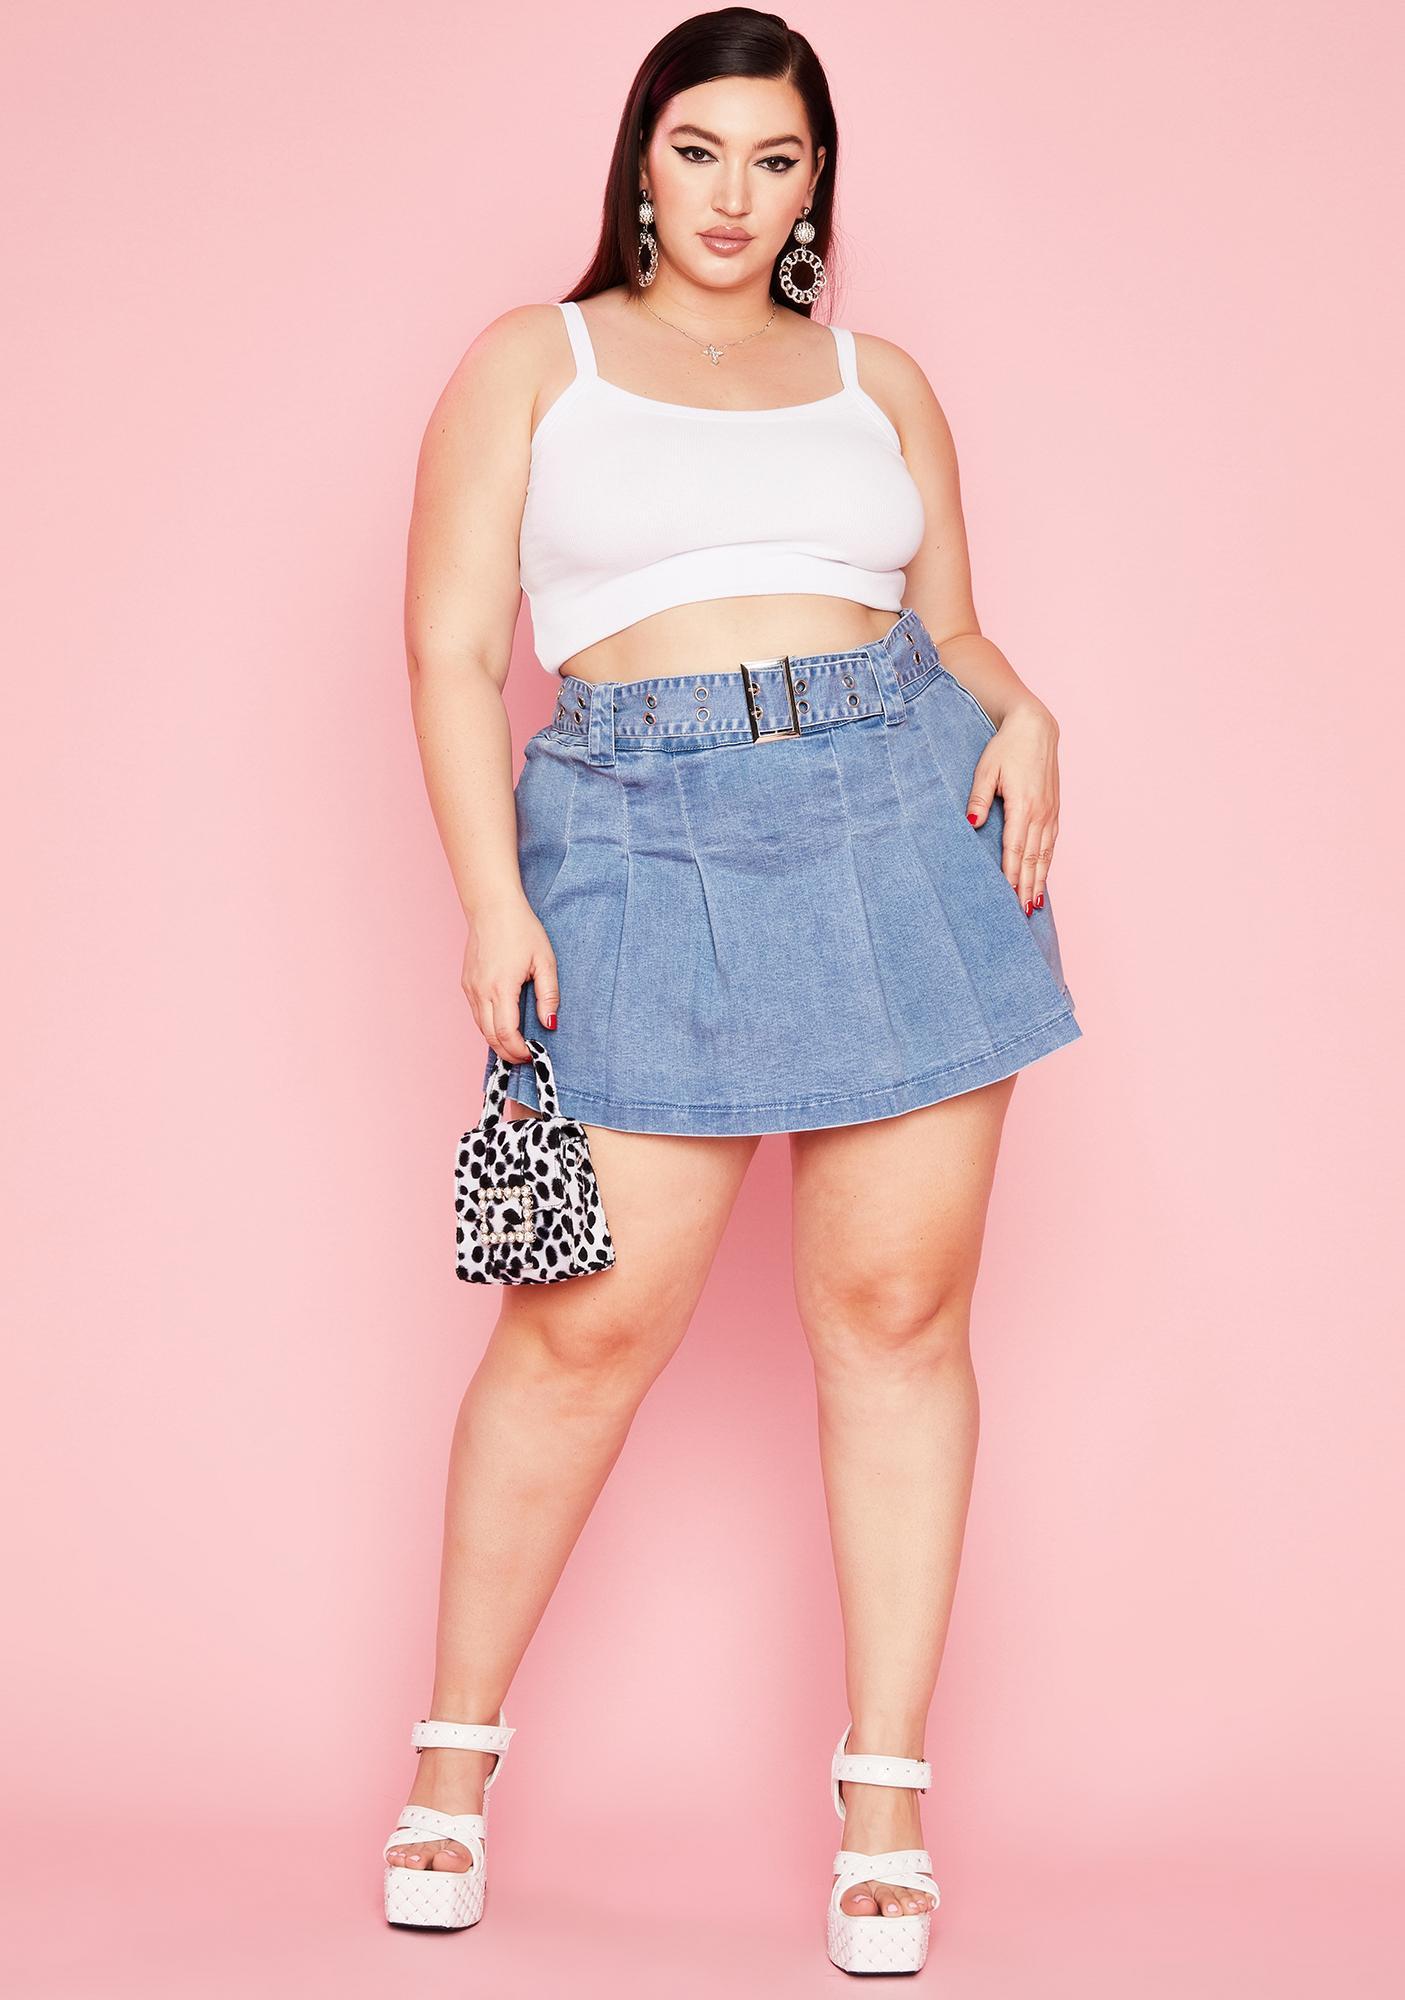 Sugar Thrillz High Maxim Capacity Pleated Skirt